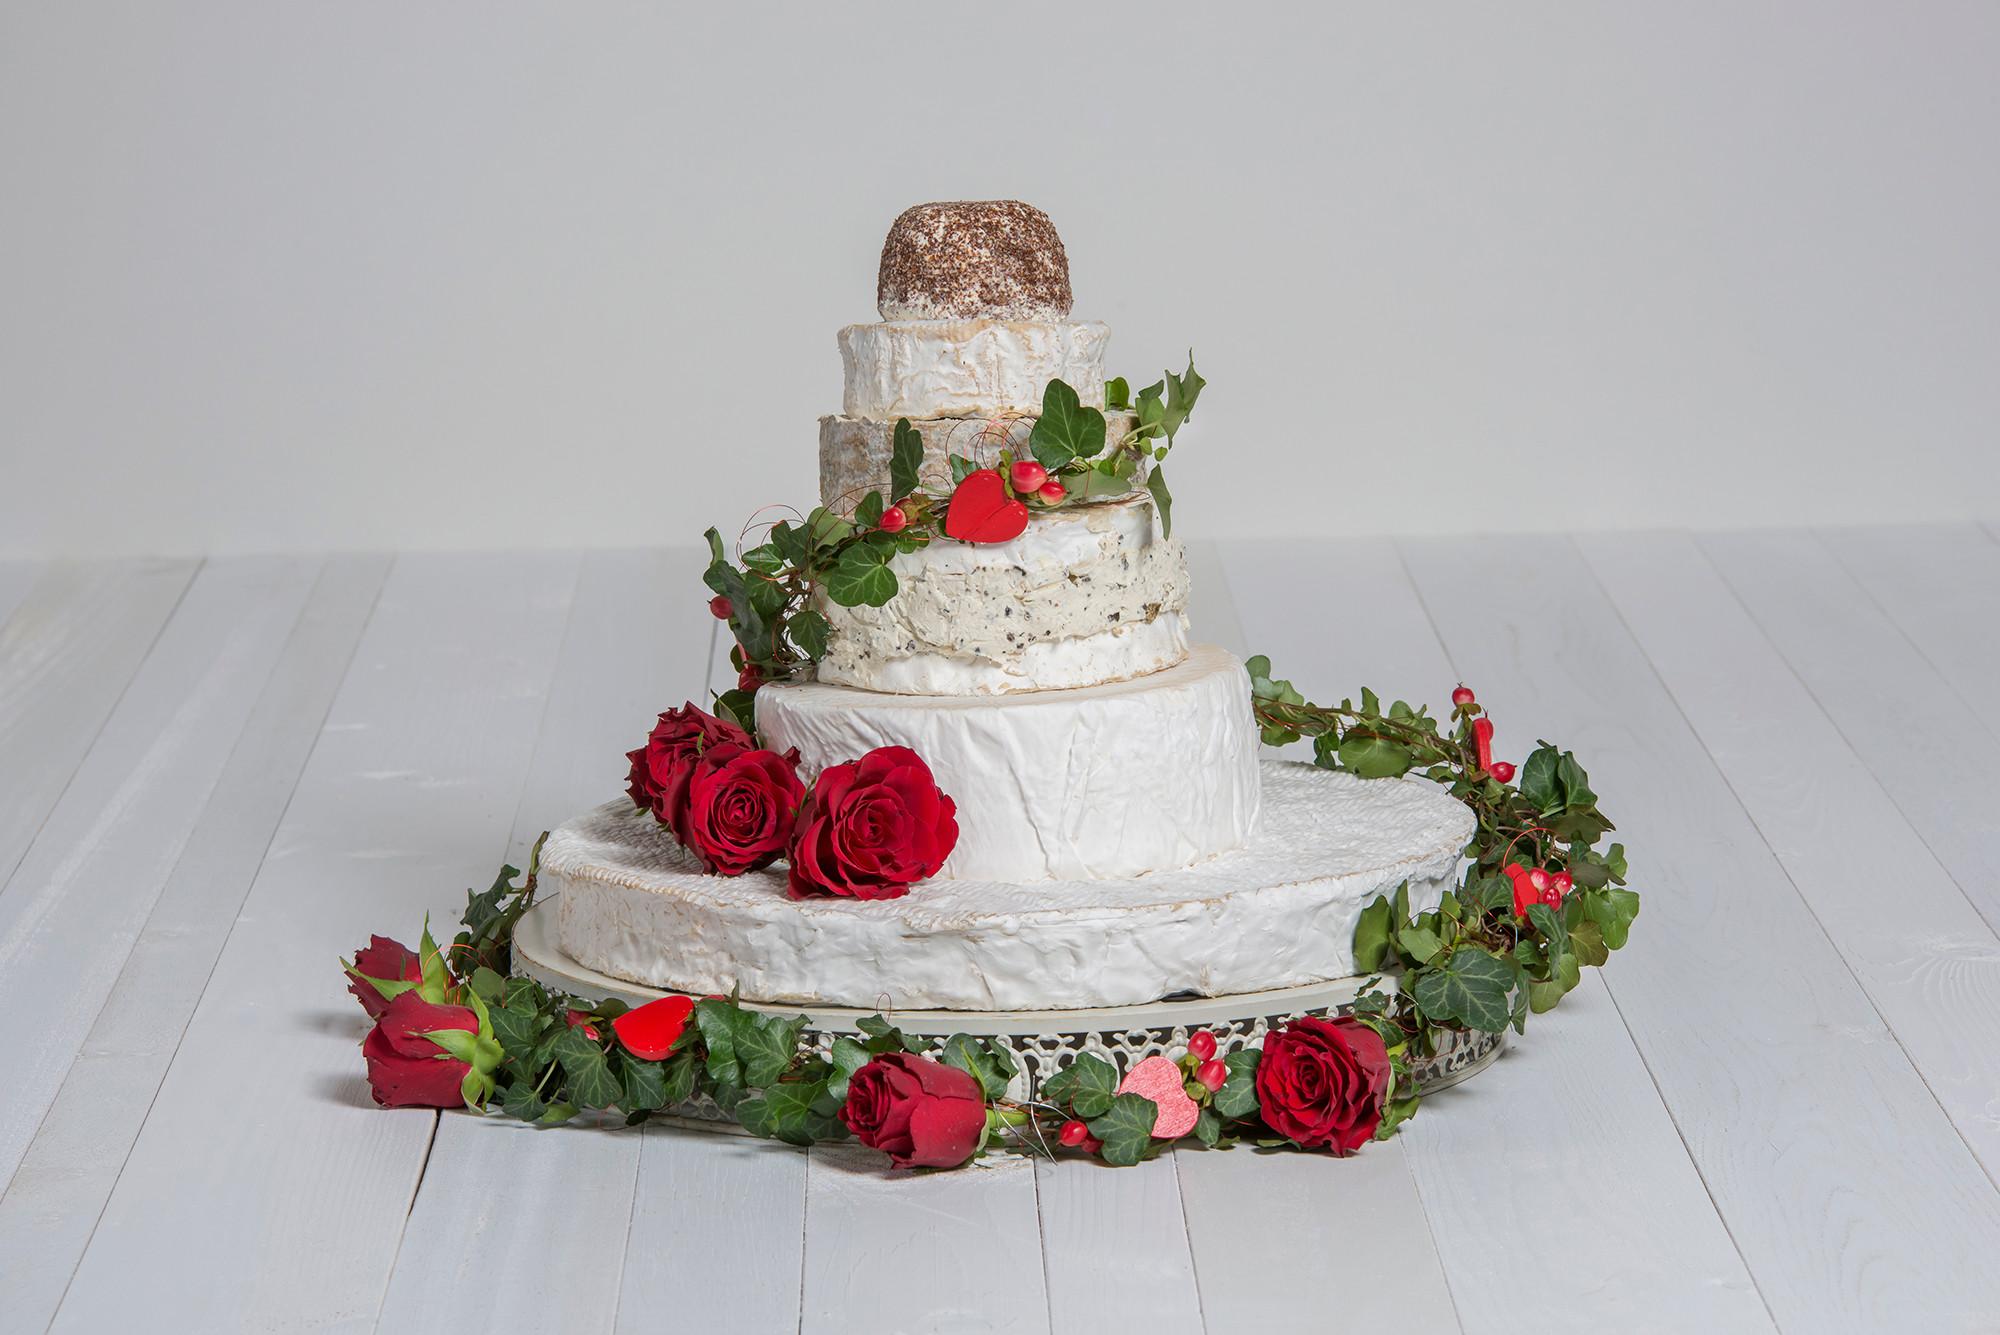 Sophia | Käse-Hochzeitstorte